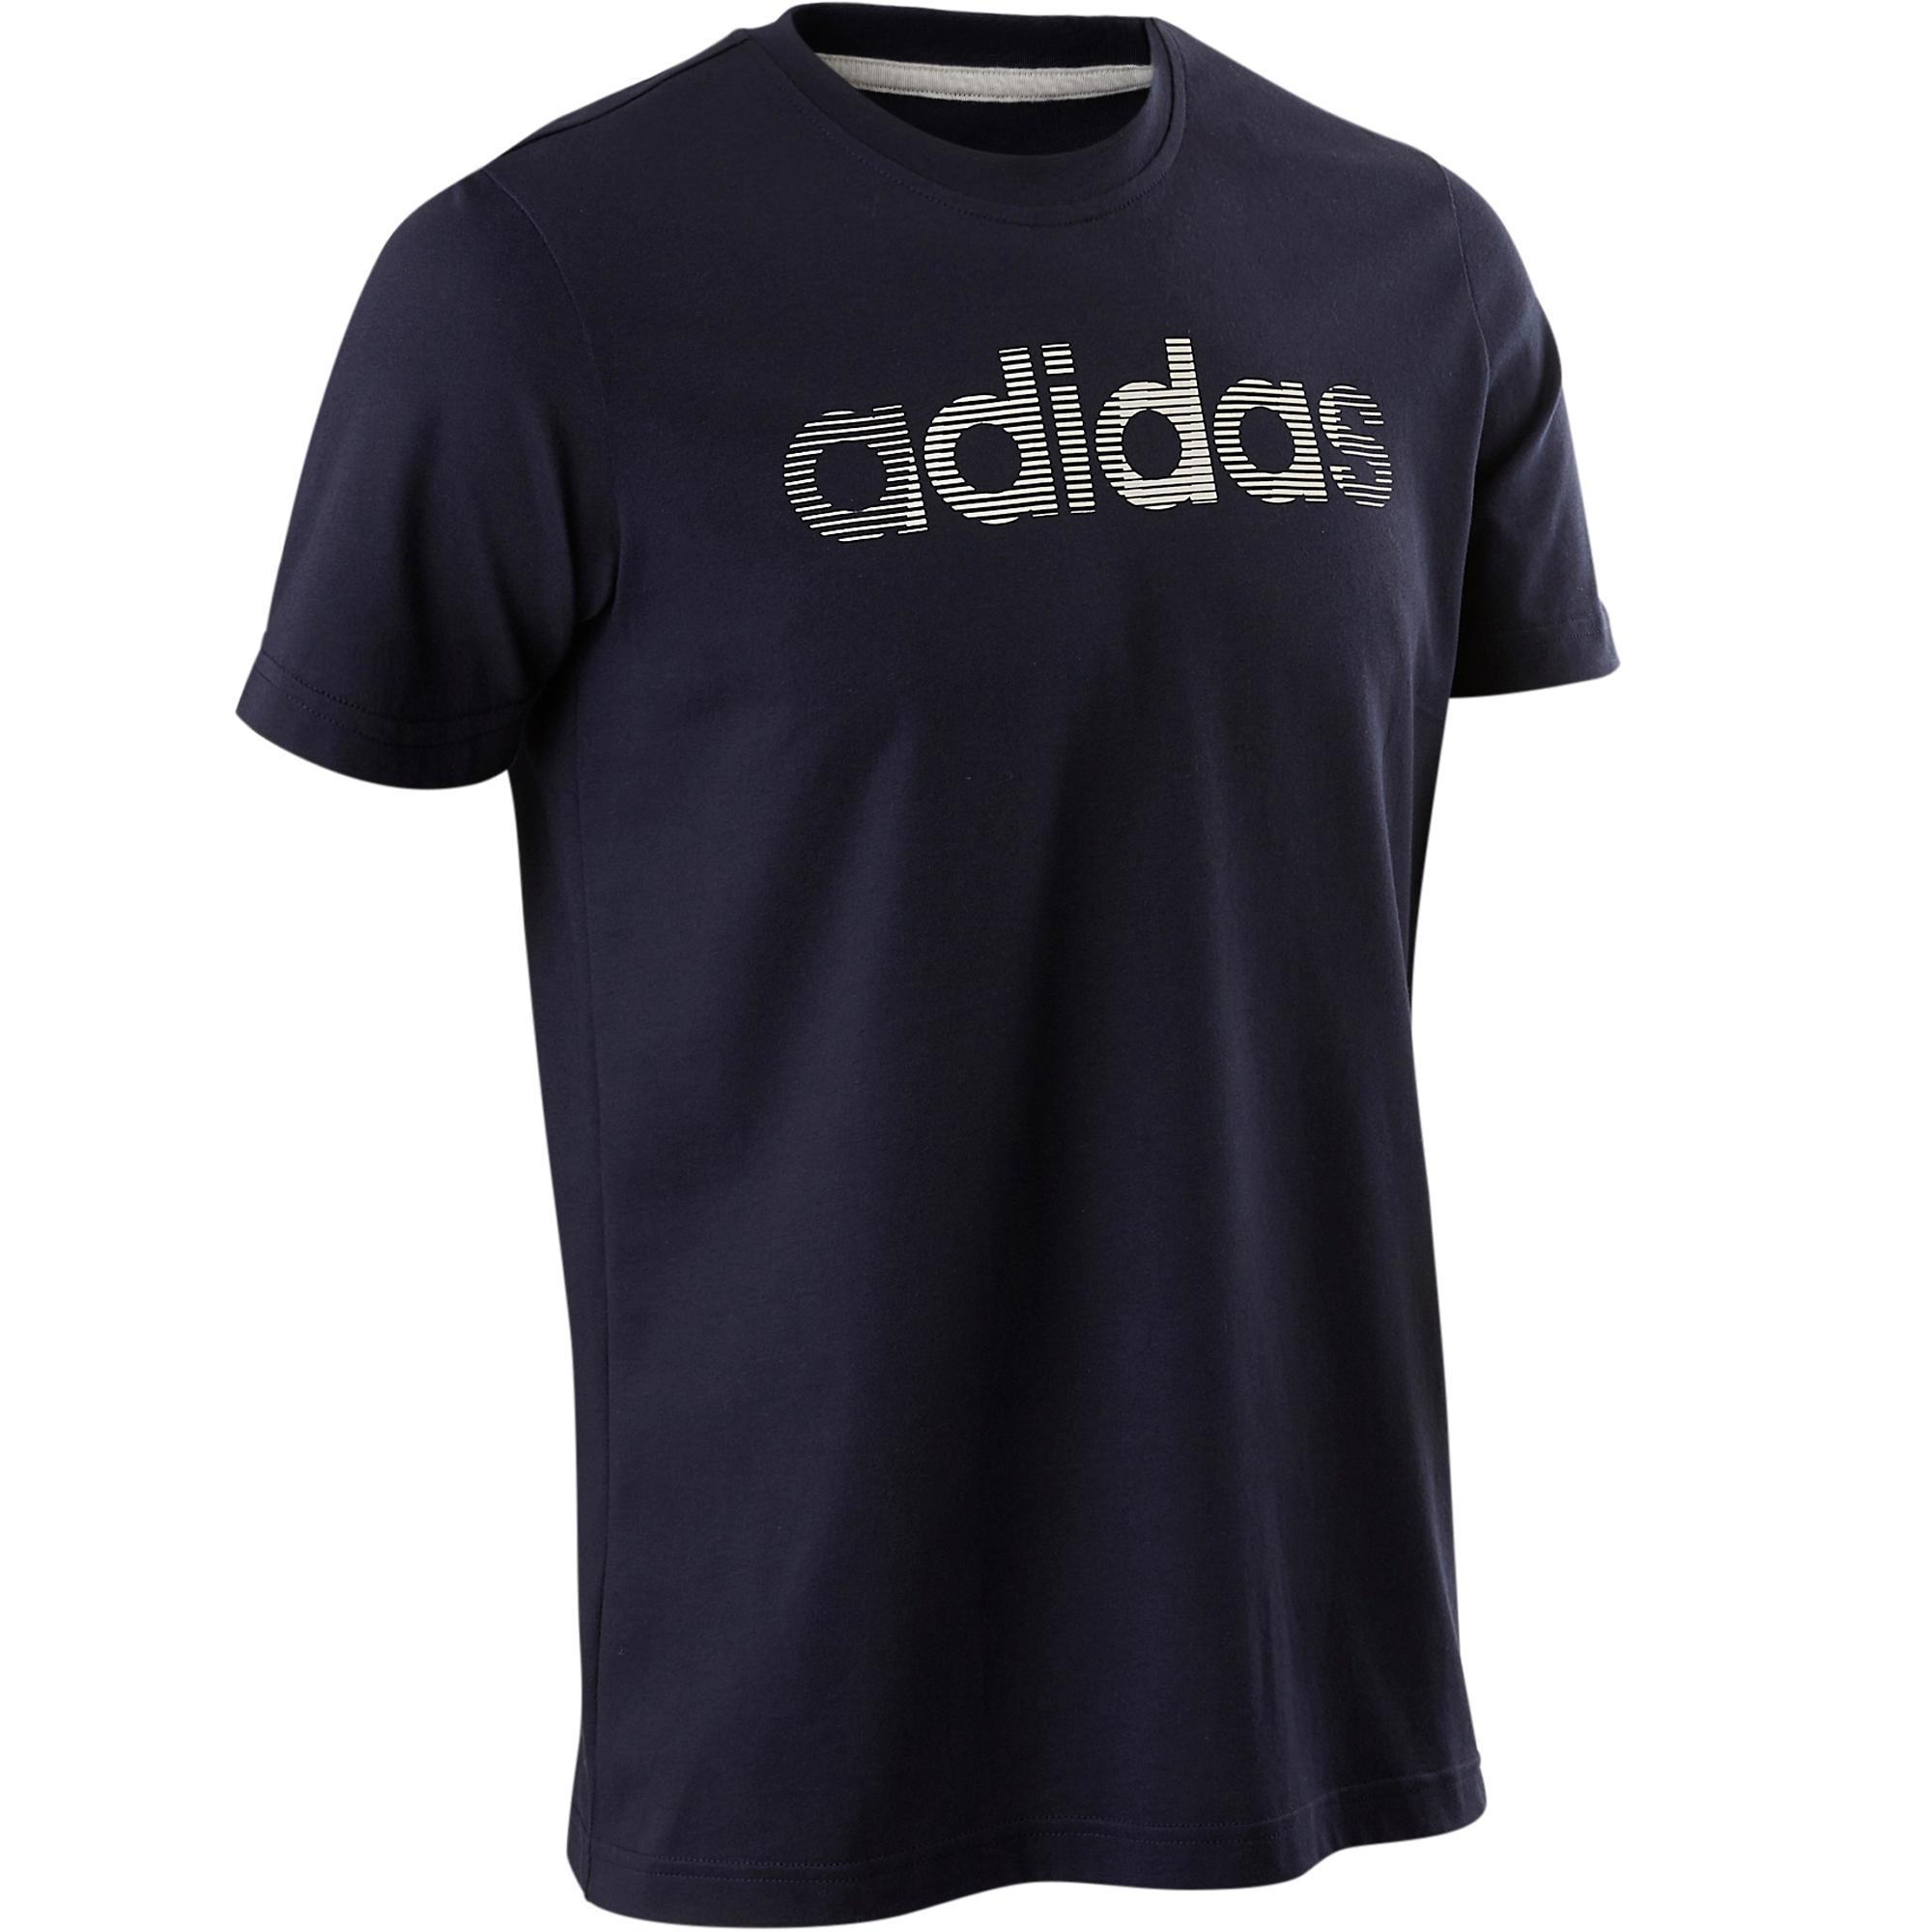 T-Shirt Decadio 500 Gym Herren blau | Sportbekleidung > Sportshirts > Poloshirts | Adidas